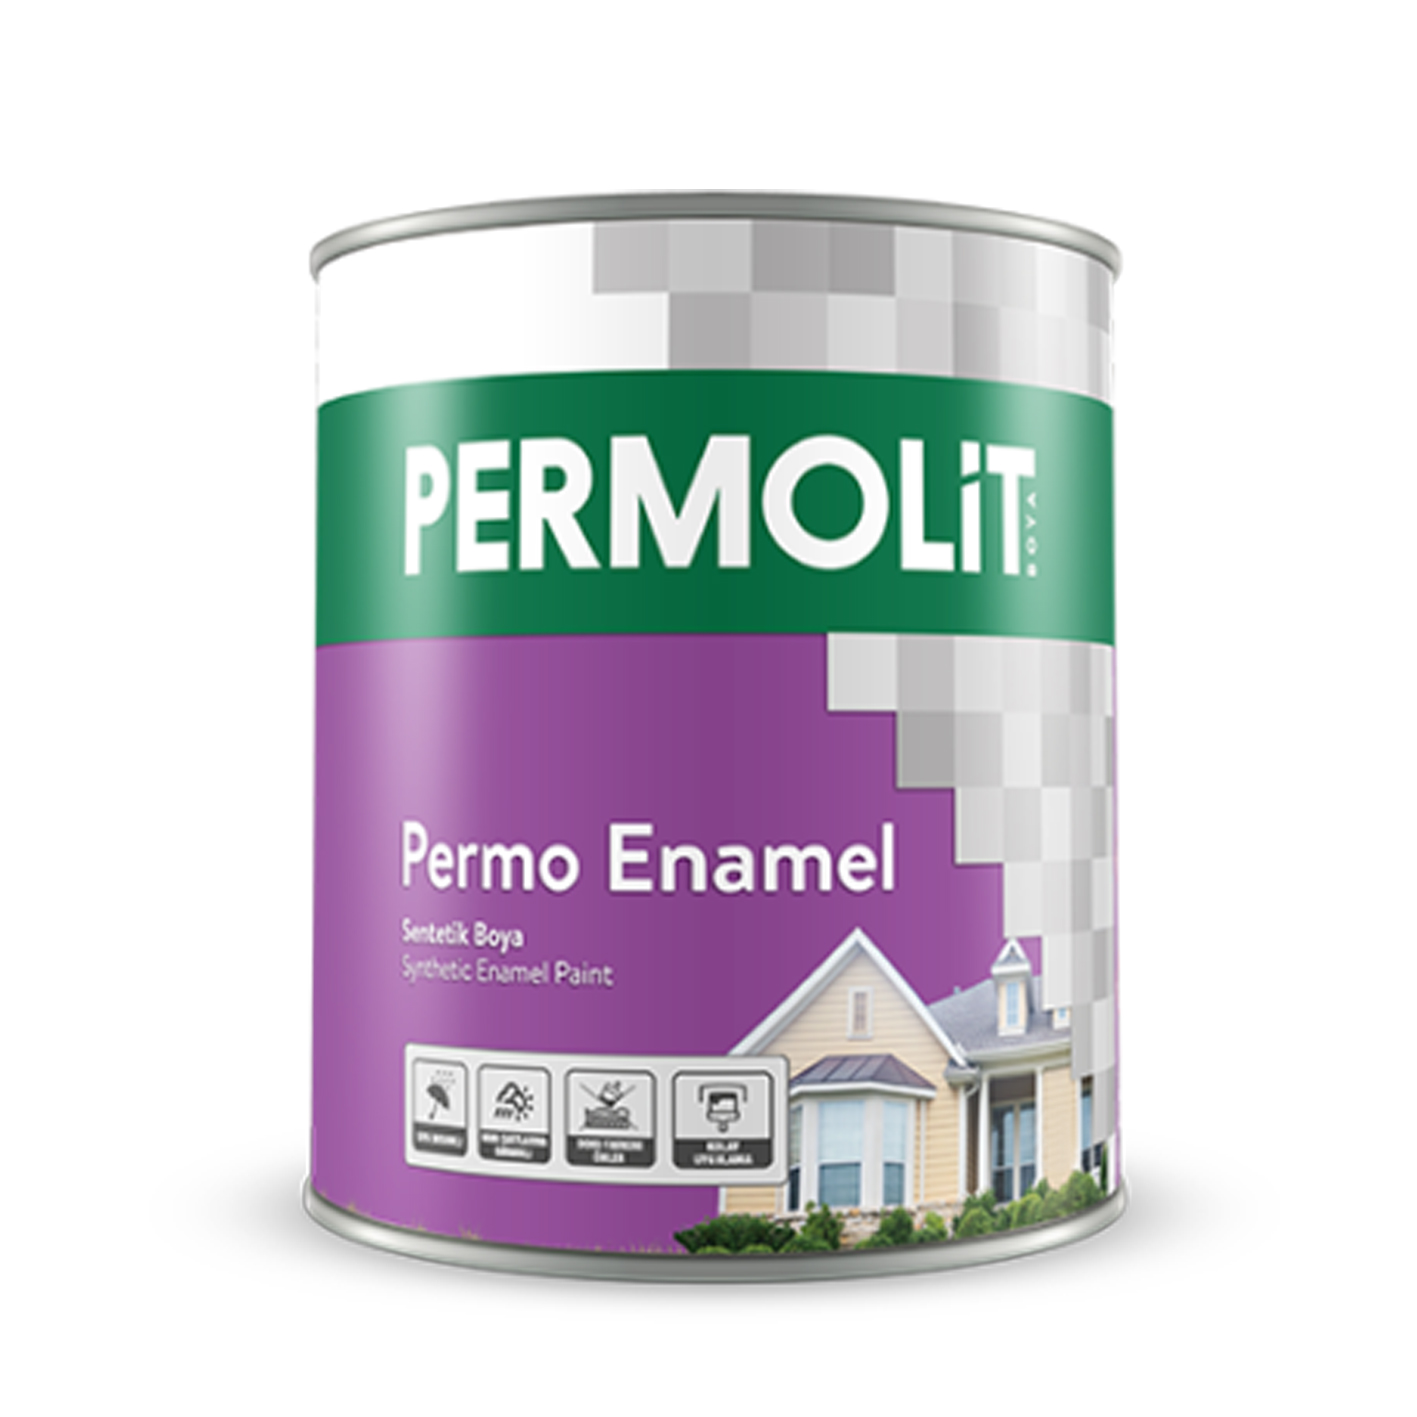 Permolit Permo Enamel Sentetik Siyah 15Lt